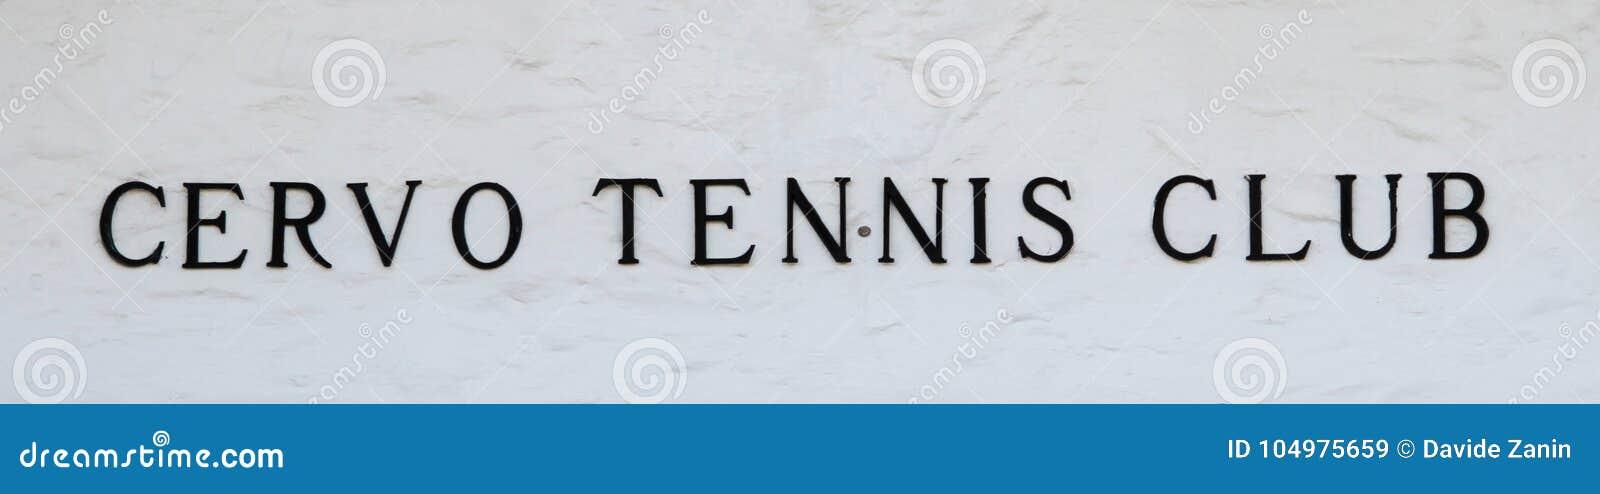 Oporto Cervo, Cerdeña, Italia - club de tenis